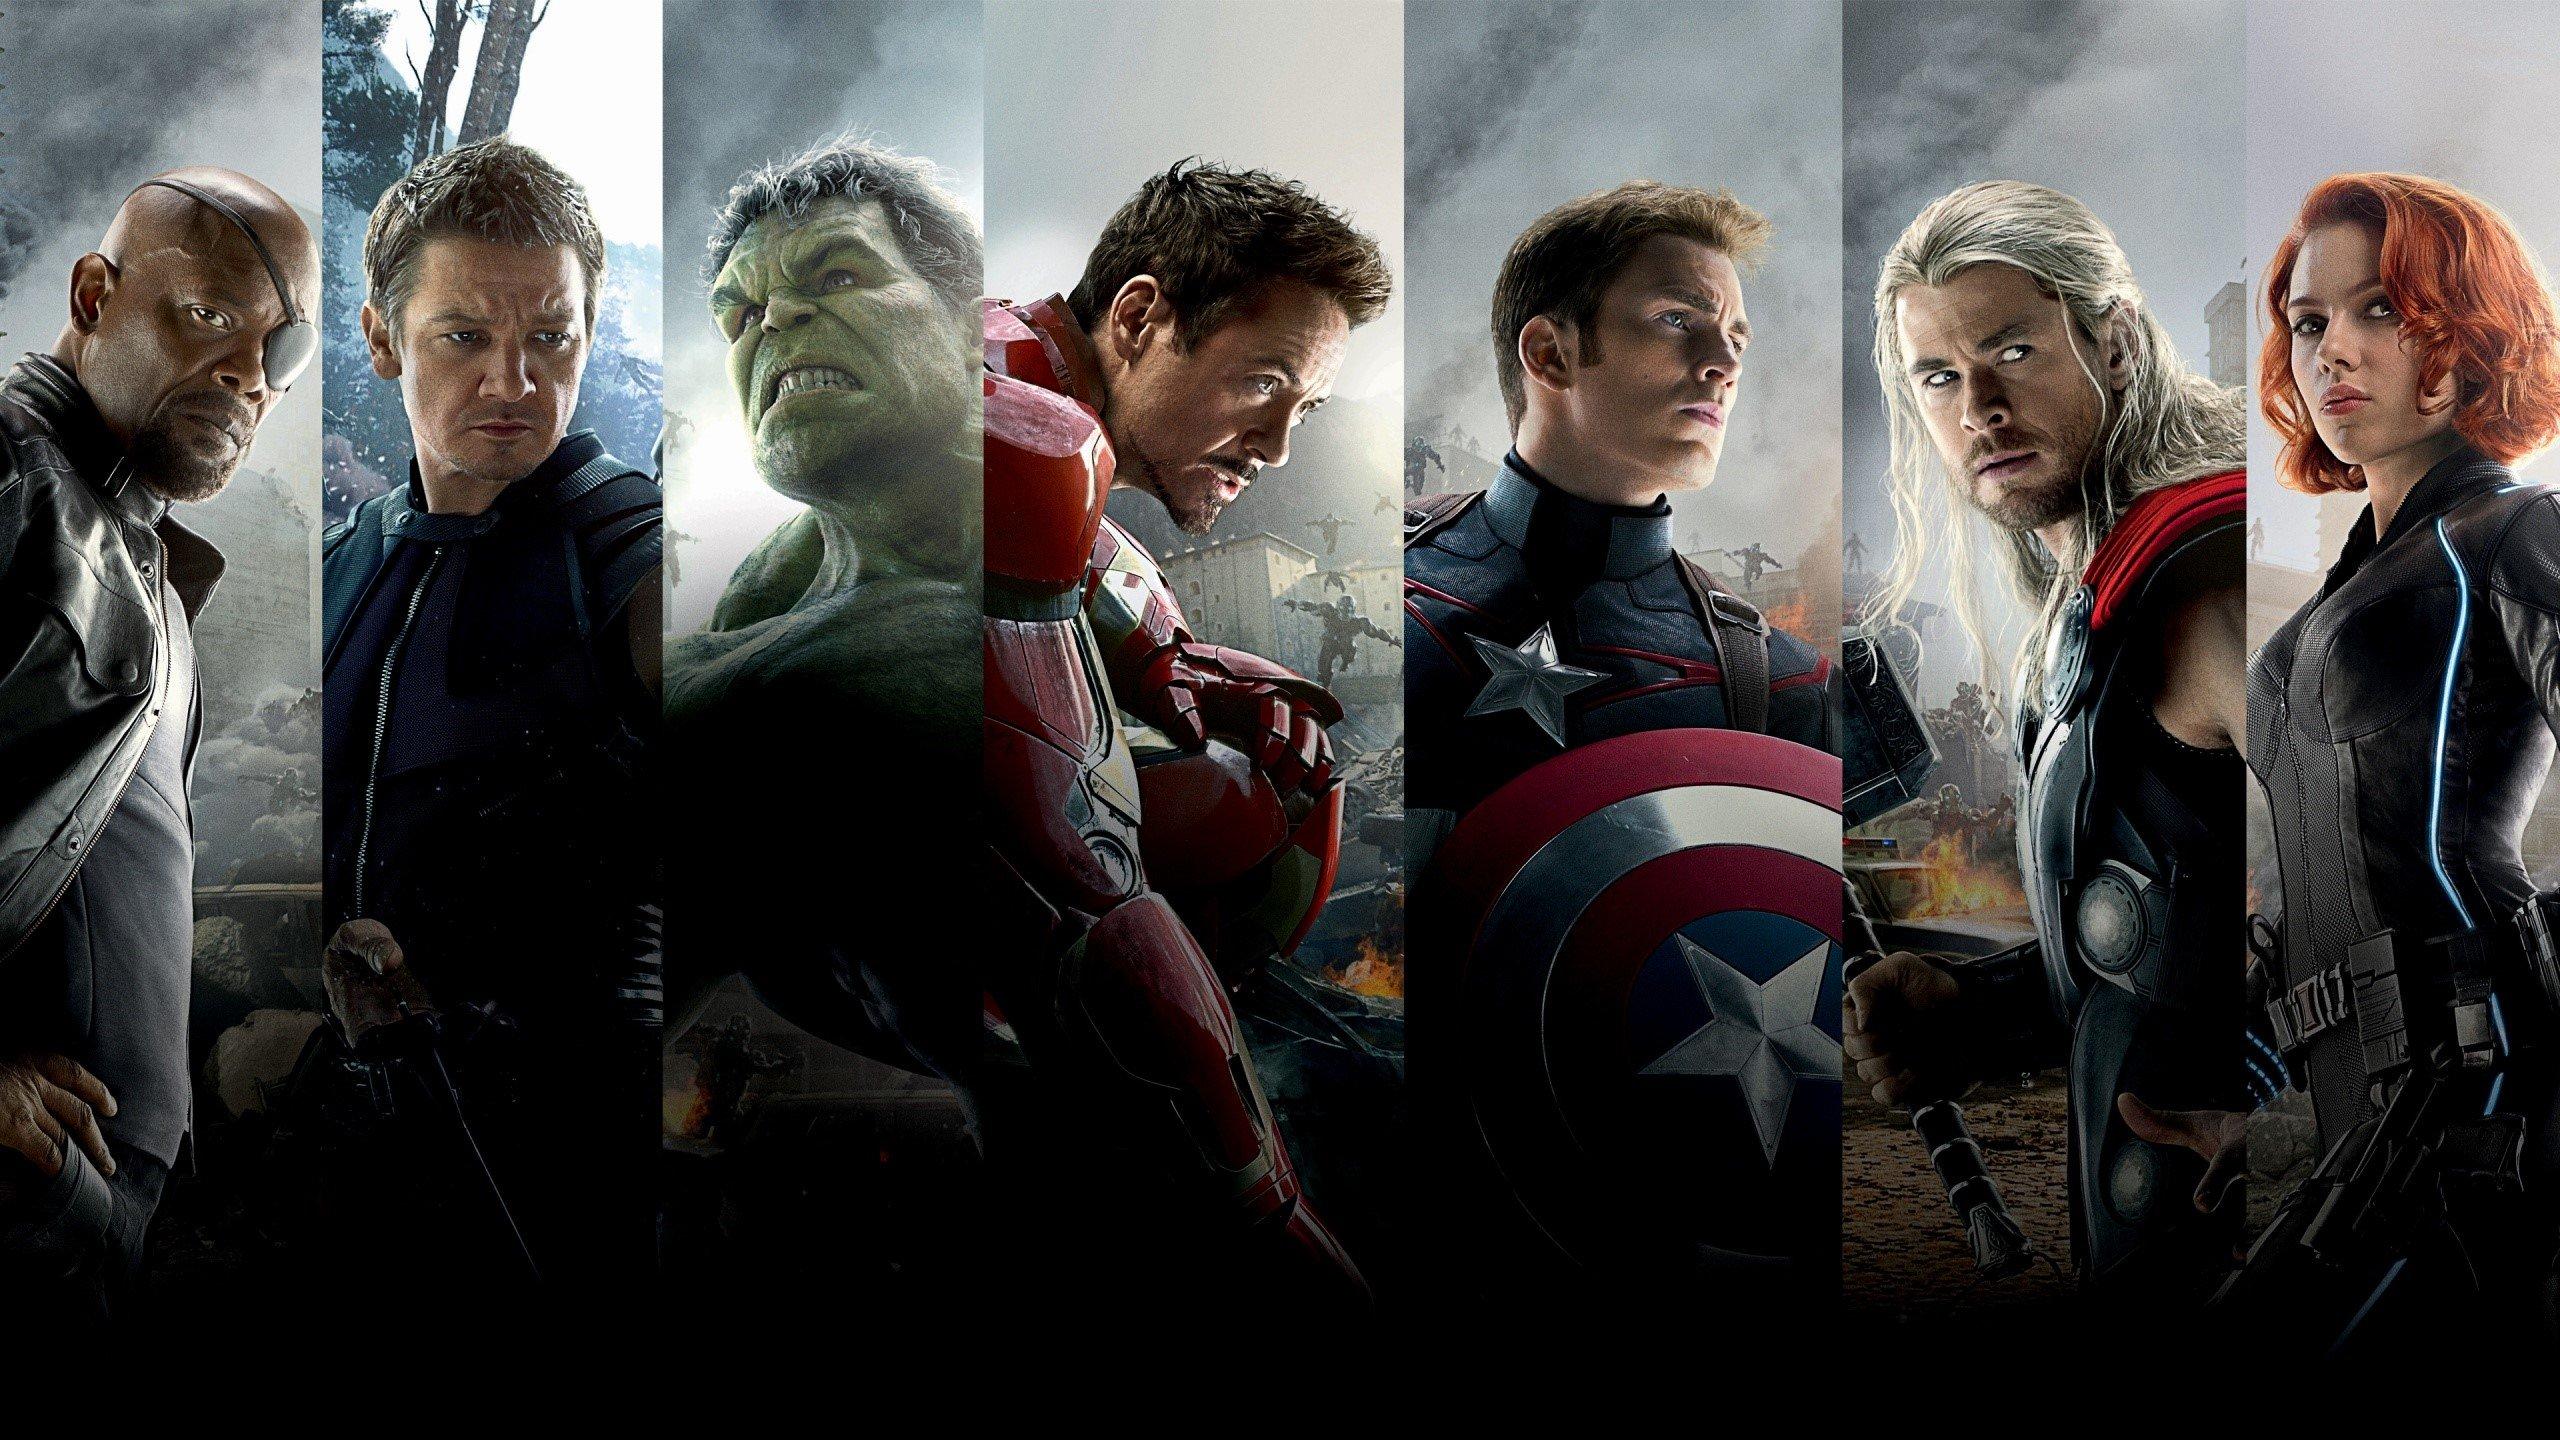 Fondos de pantalla Avengers